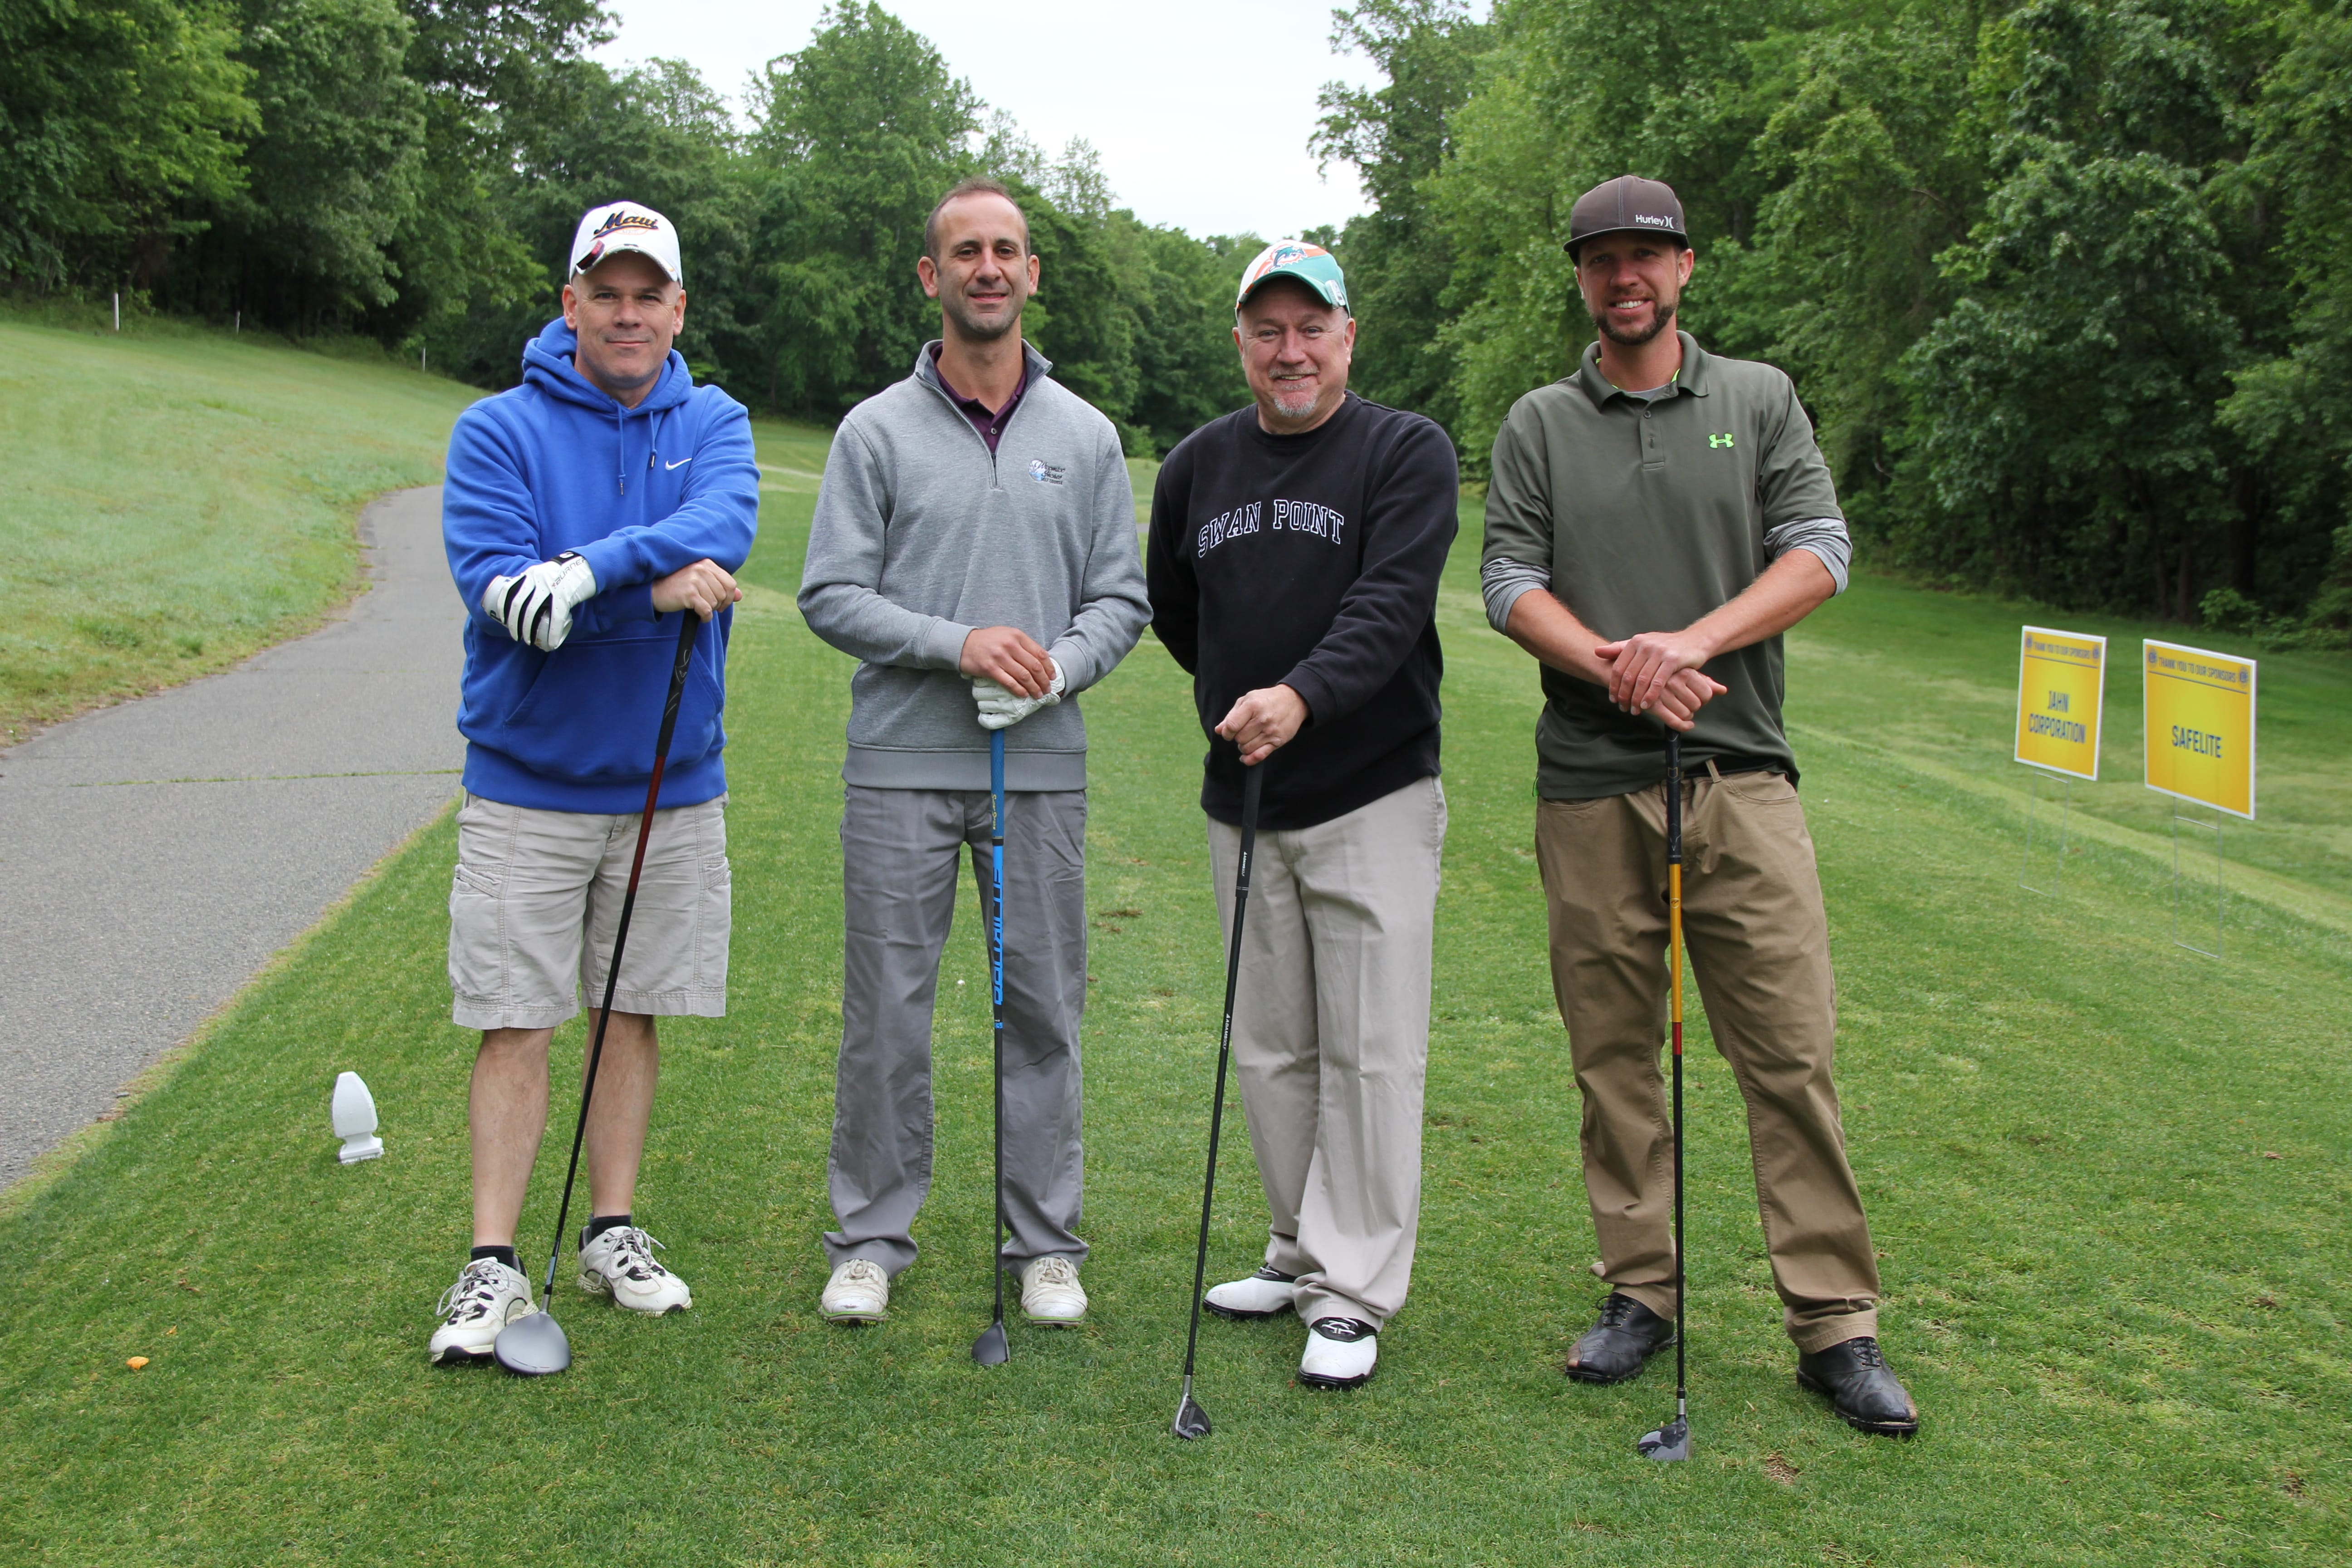 IMG_5915 - Team 7 - Ricky Lacey, Jason Masri, Keith Rollins, Brandon Gronert